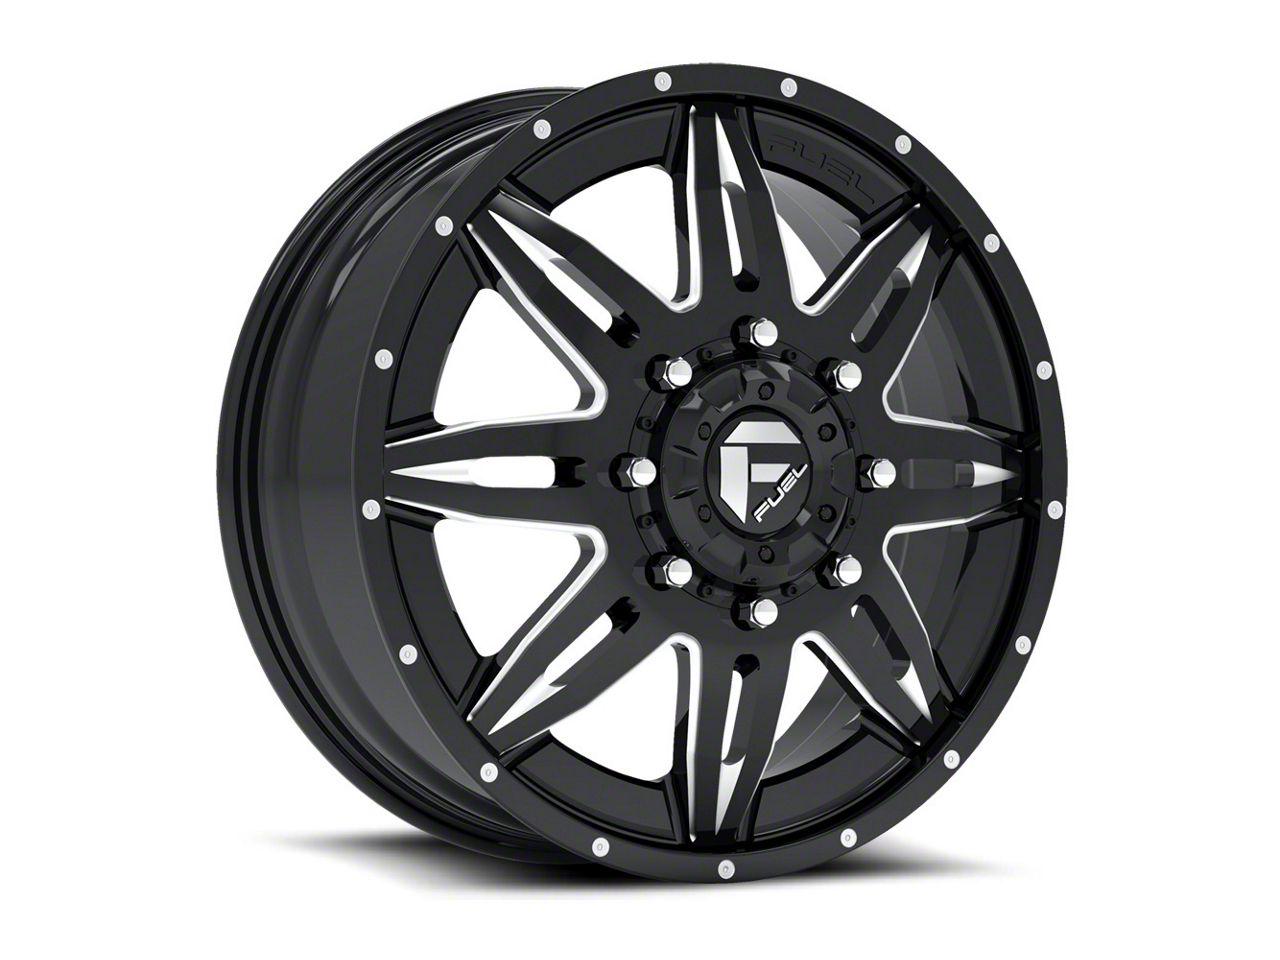 Fuel Wheels Lethal Black Milled 6-Lug Wheel - 22x12 (99-18 Silverado 1500)